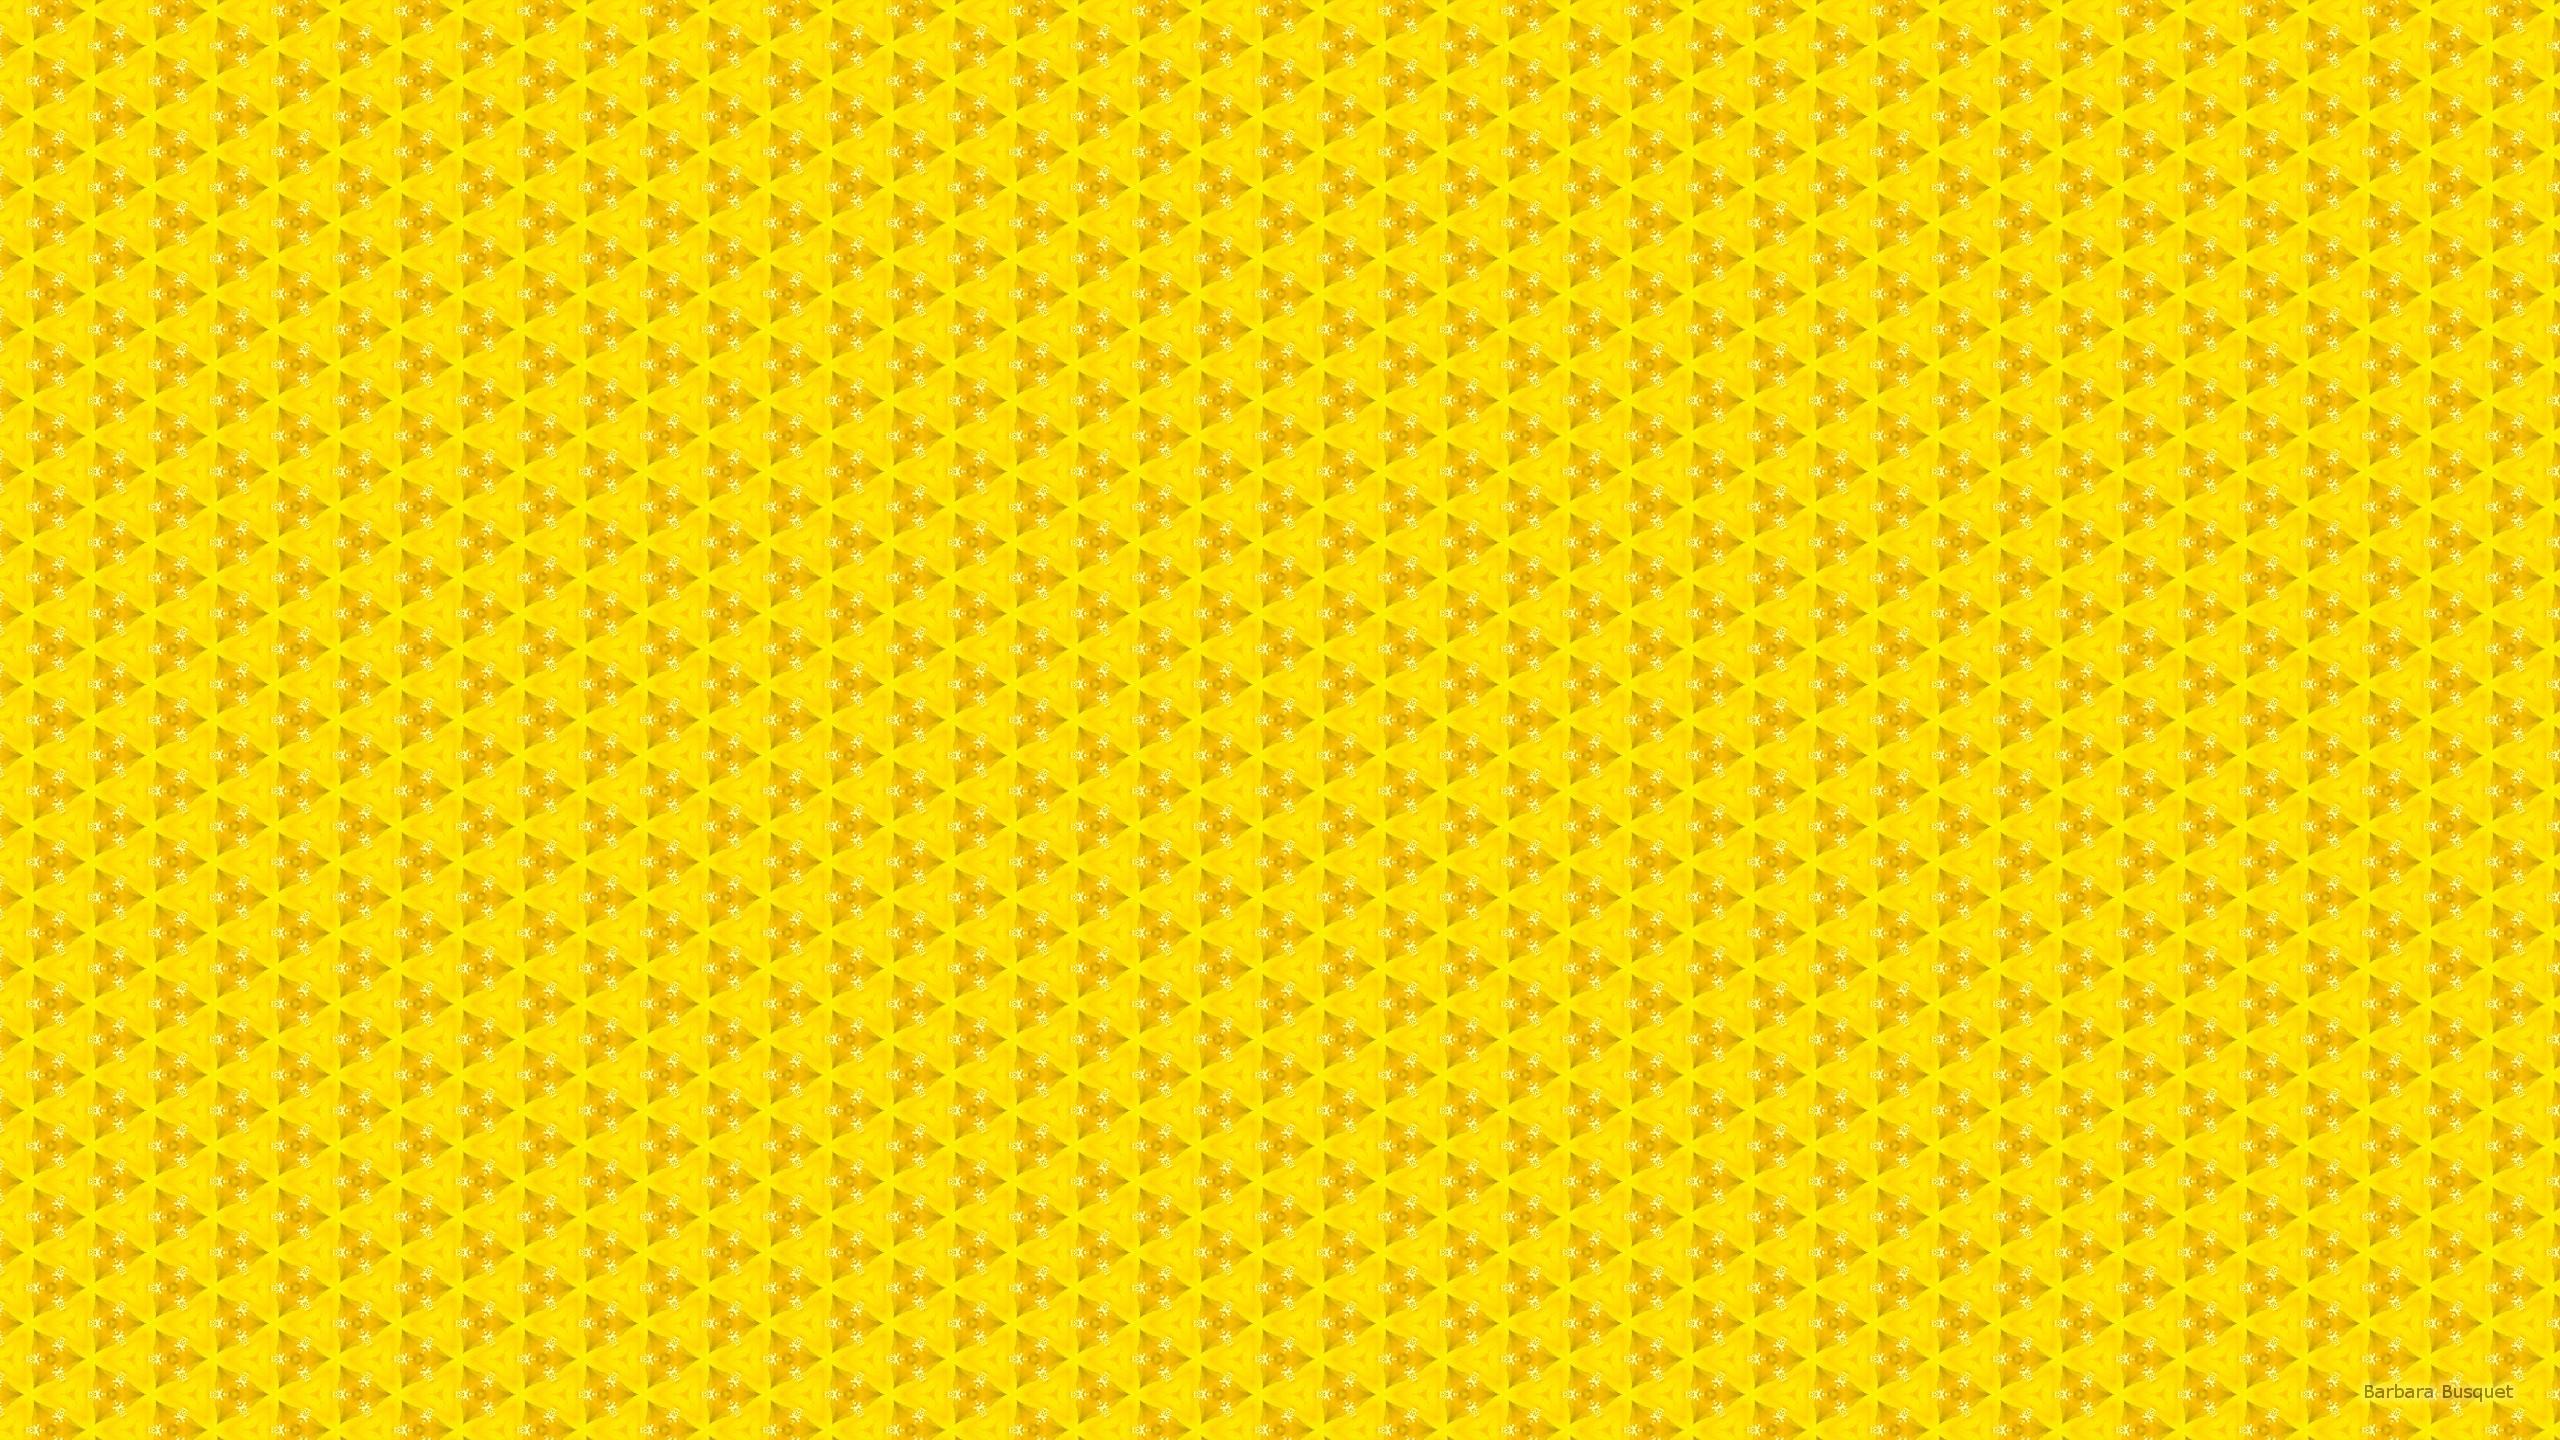 yellow ipad desktop backgrounds iphone mobile wallpapertag android resolution pixelstalk